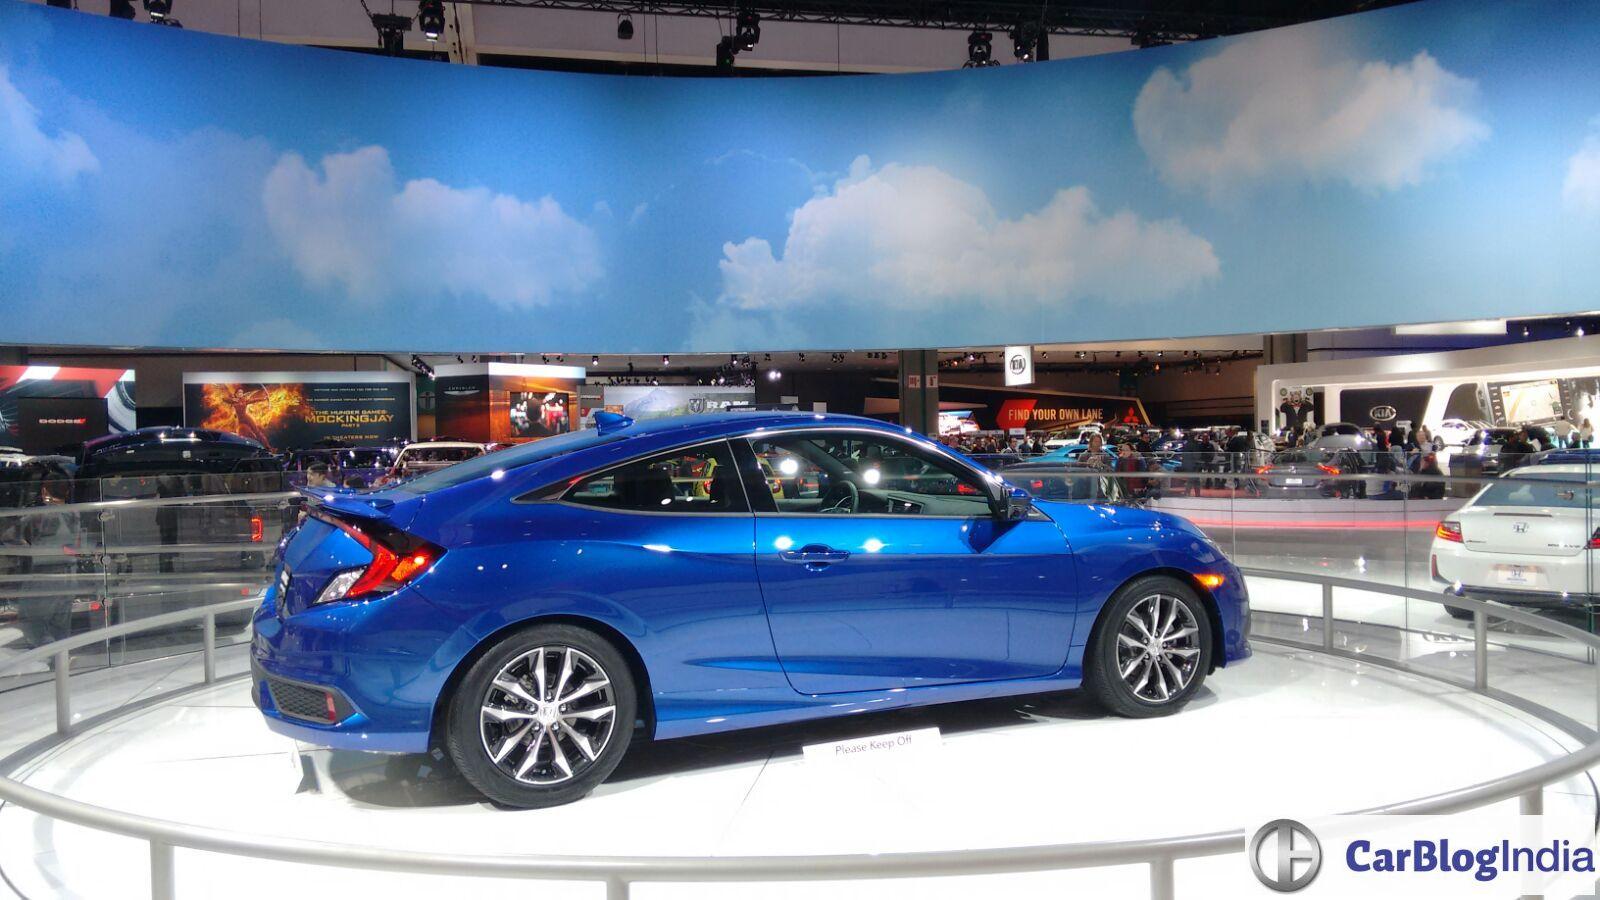 2014 Honda Civic India launch, diesel model, price, details